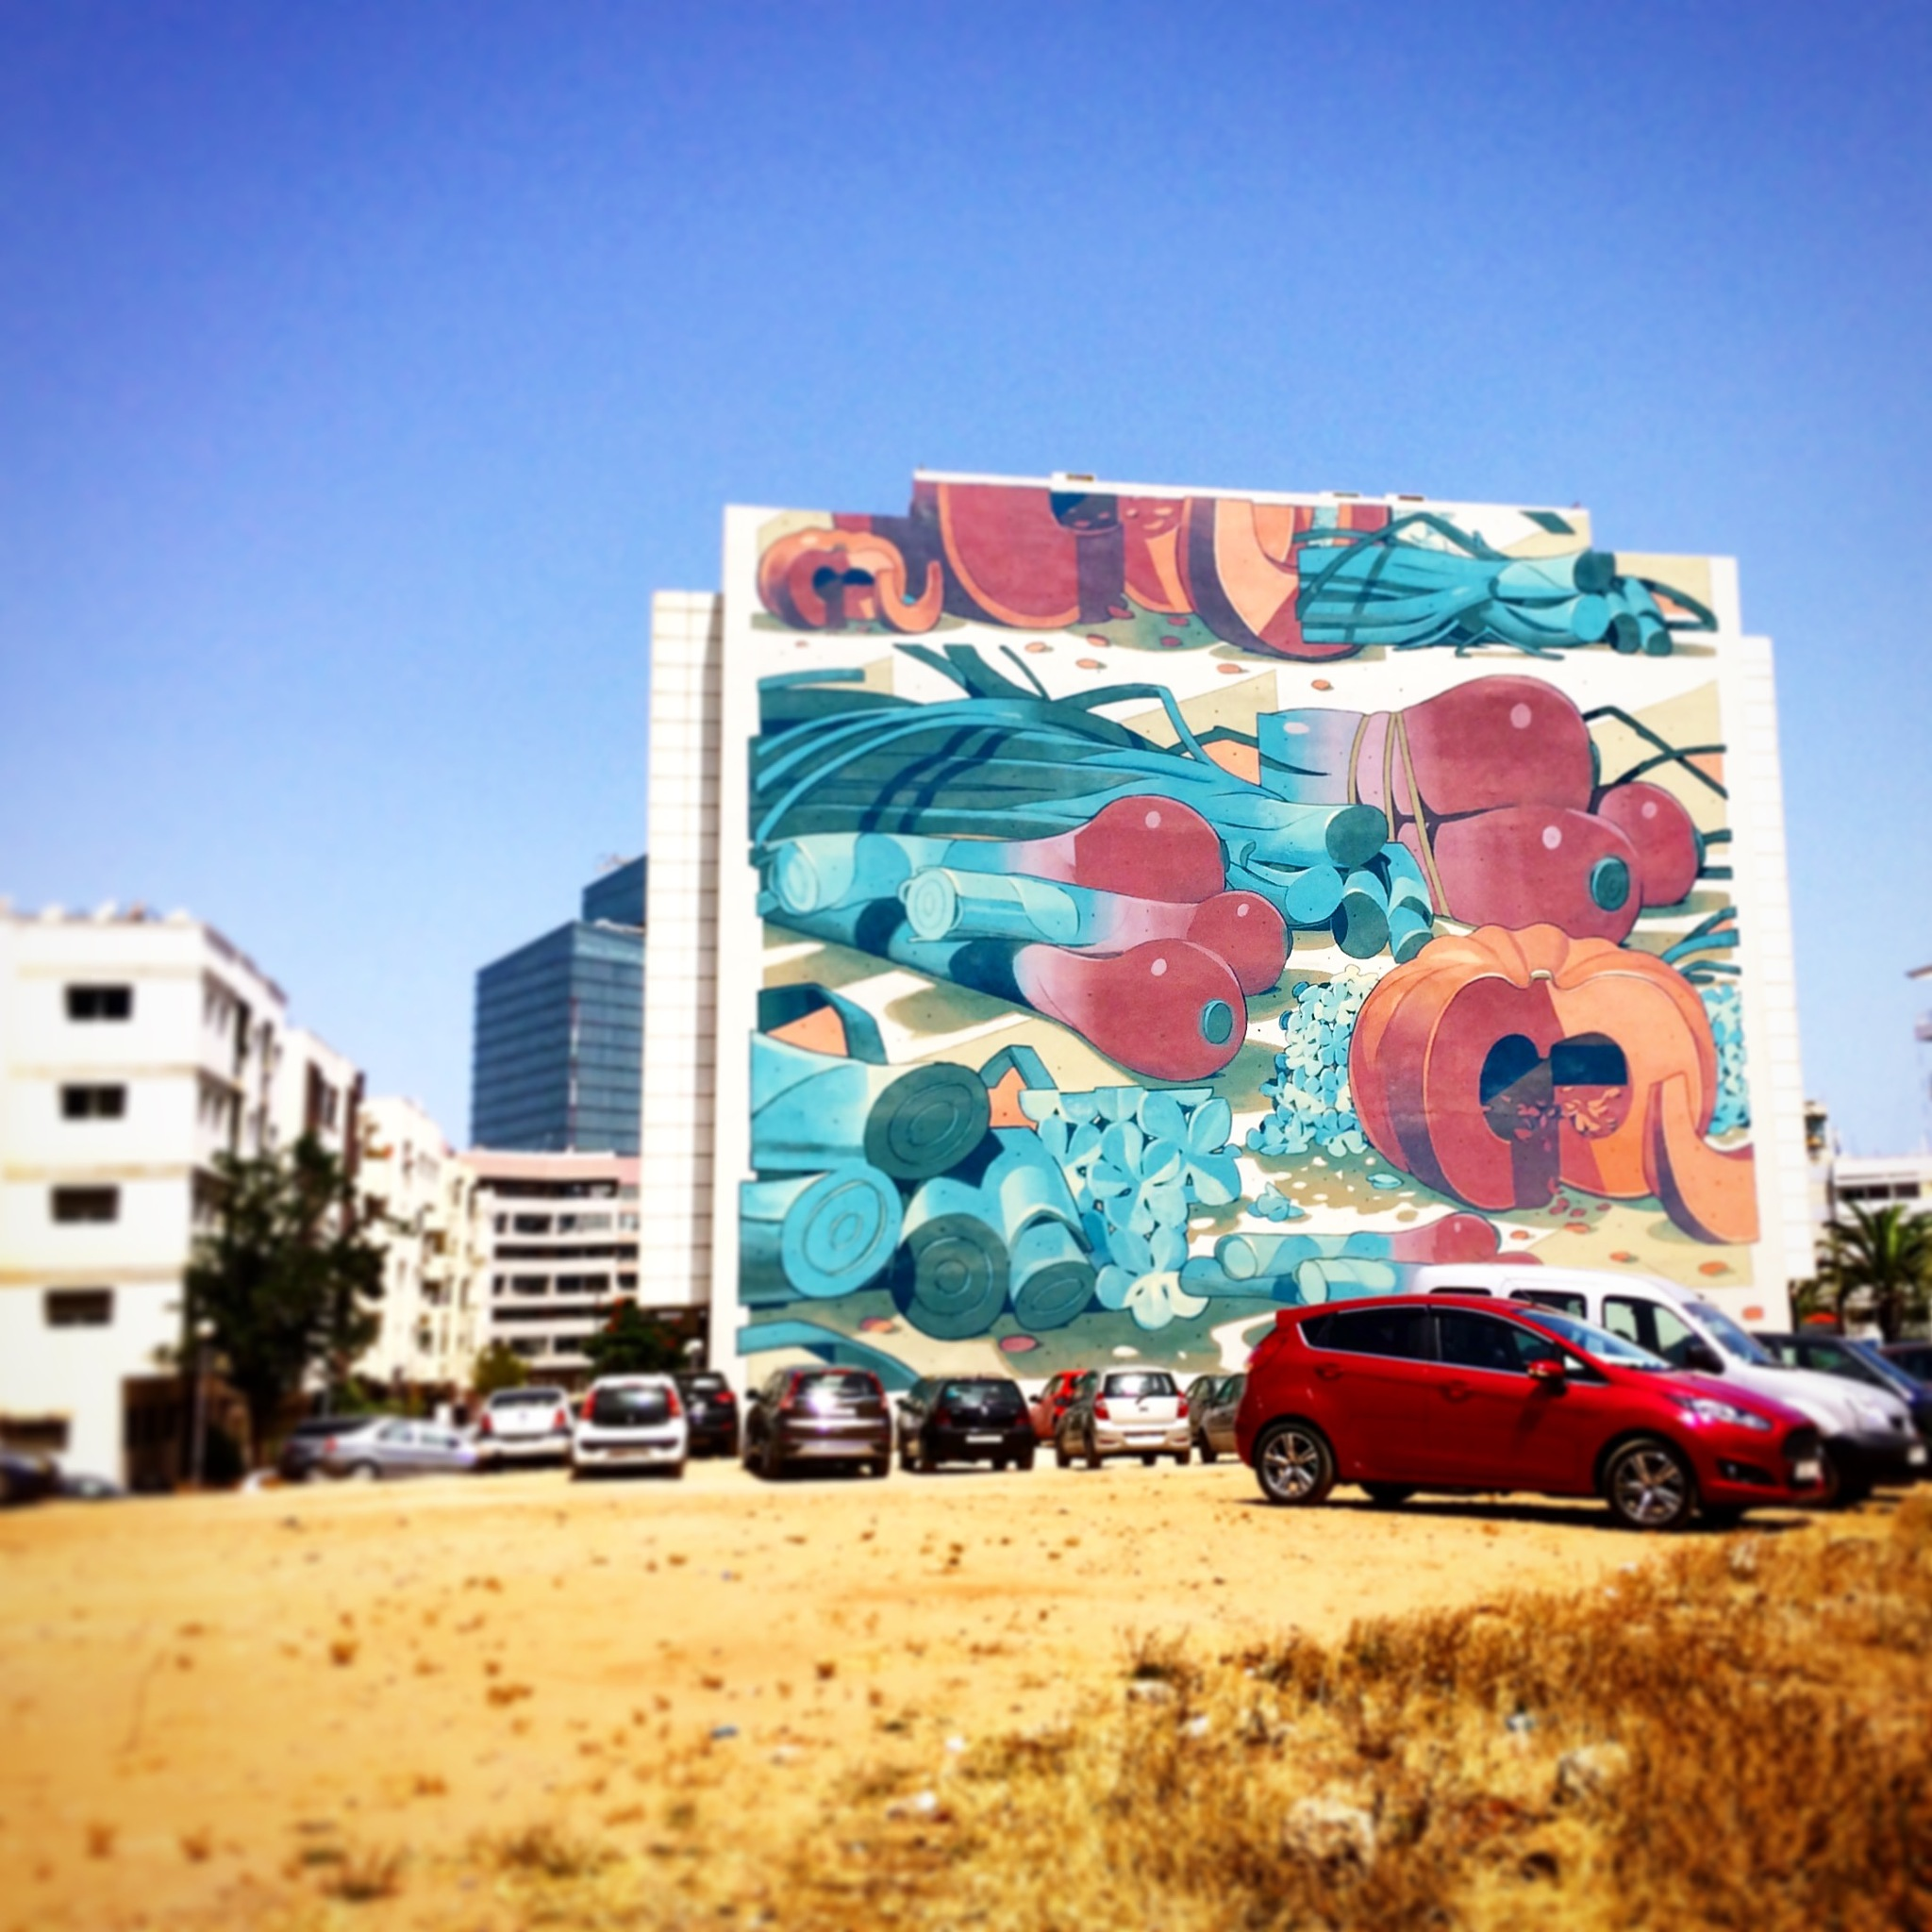 Morrocan streetart by Lina Vikman